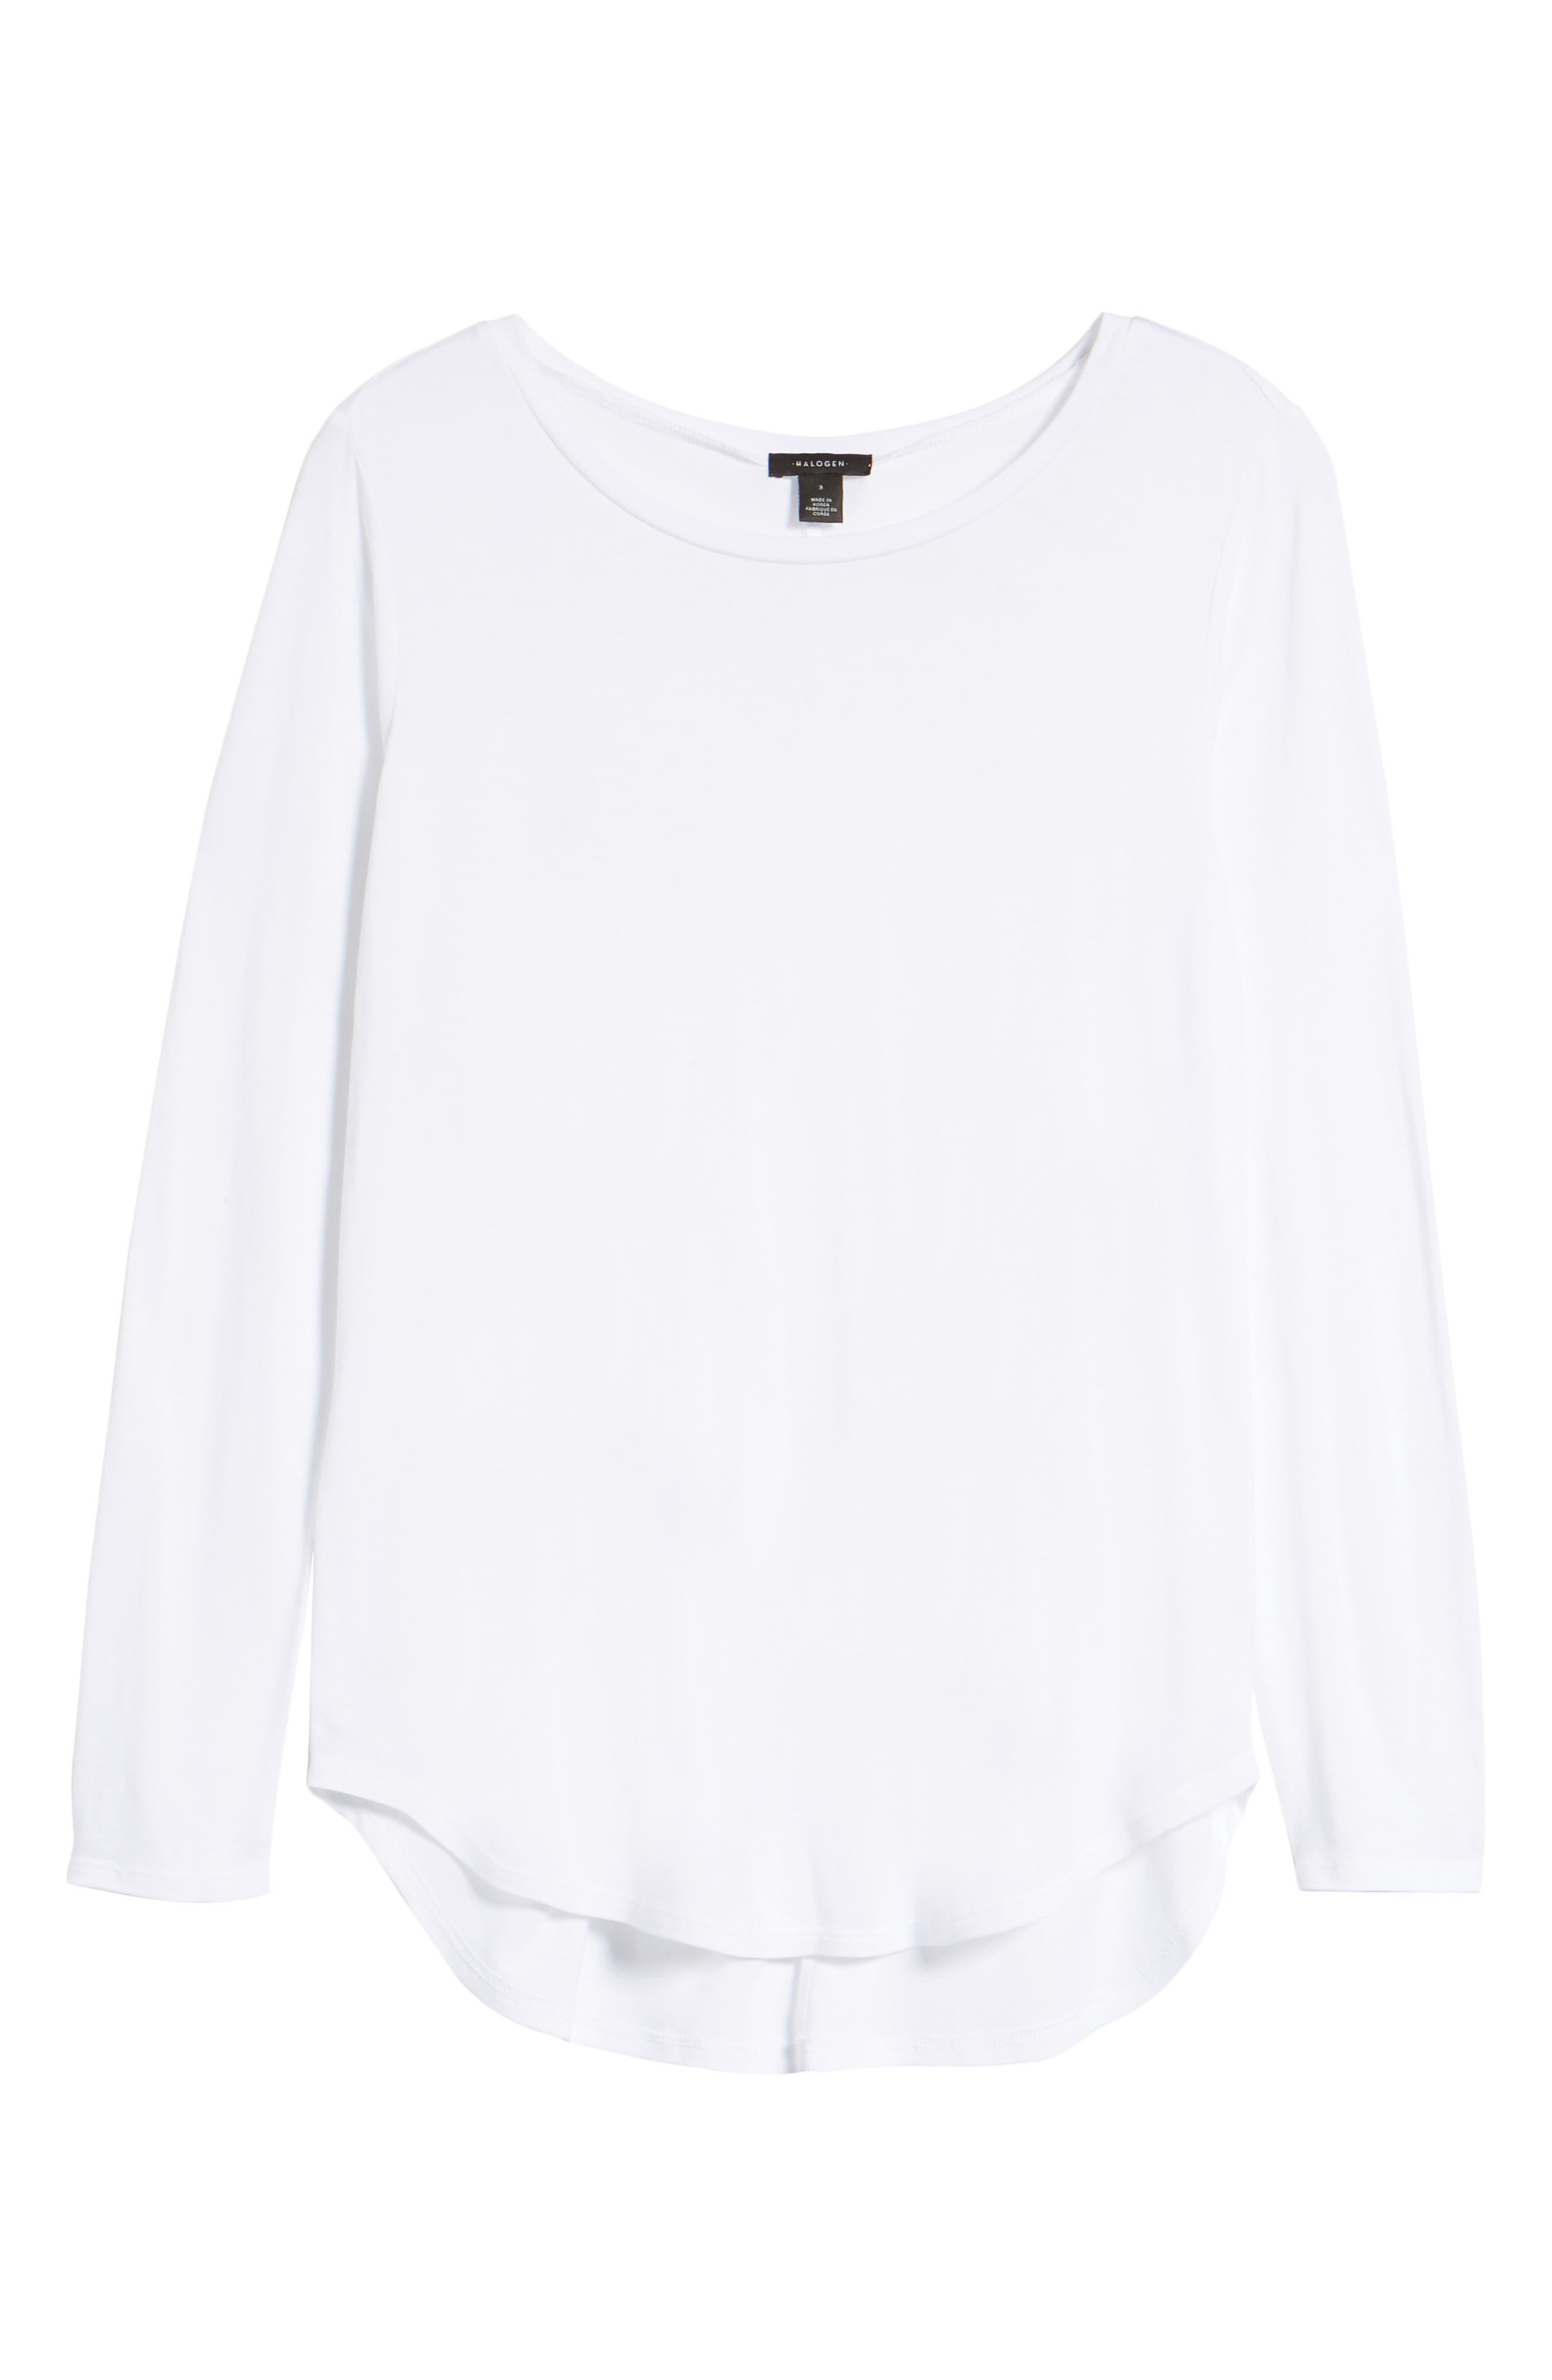 Shirttail Tee,                         Main,                         color, Ivory Cloud